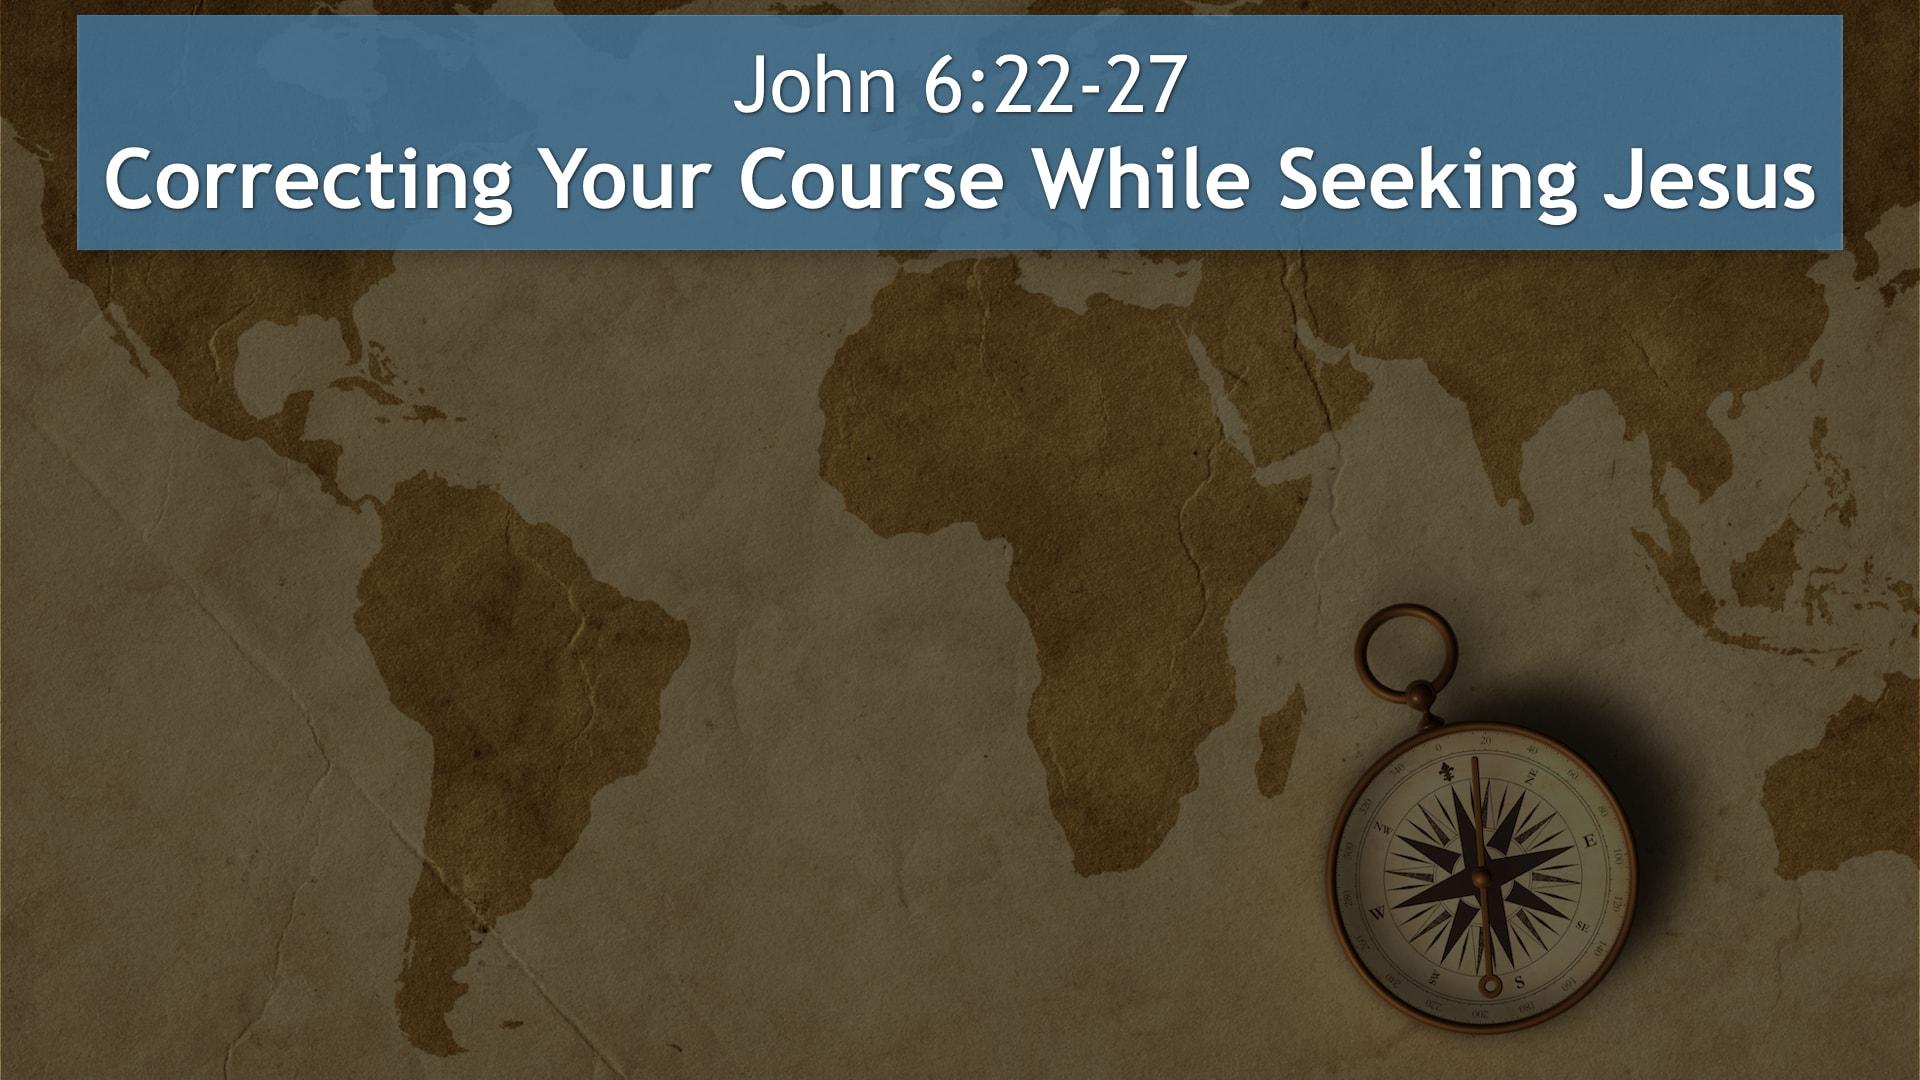 John 6:22-27, Correct Your Course While Seeking Jesus